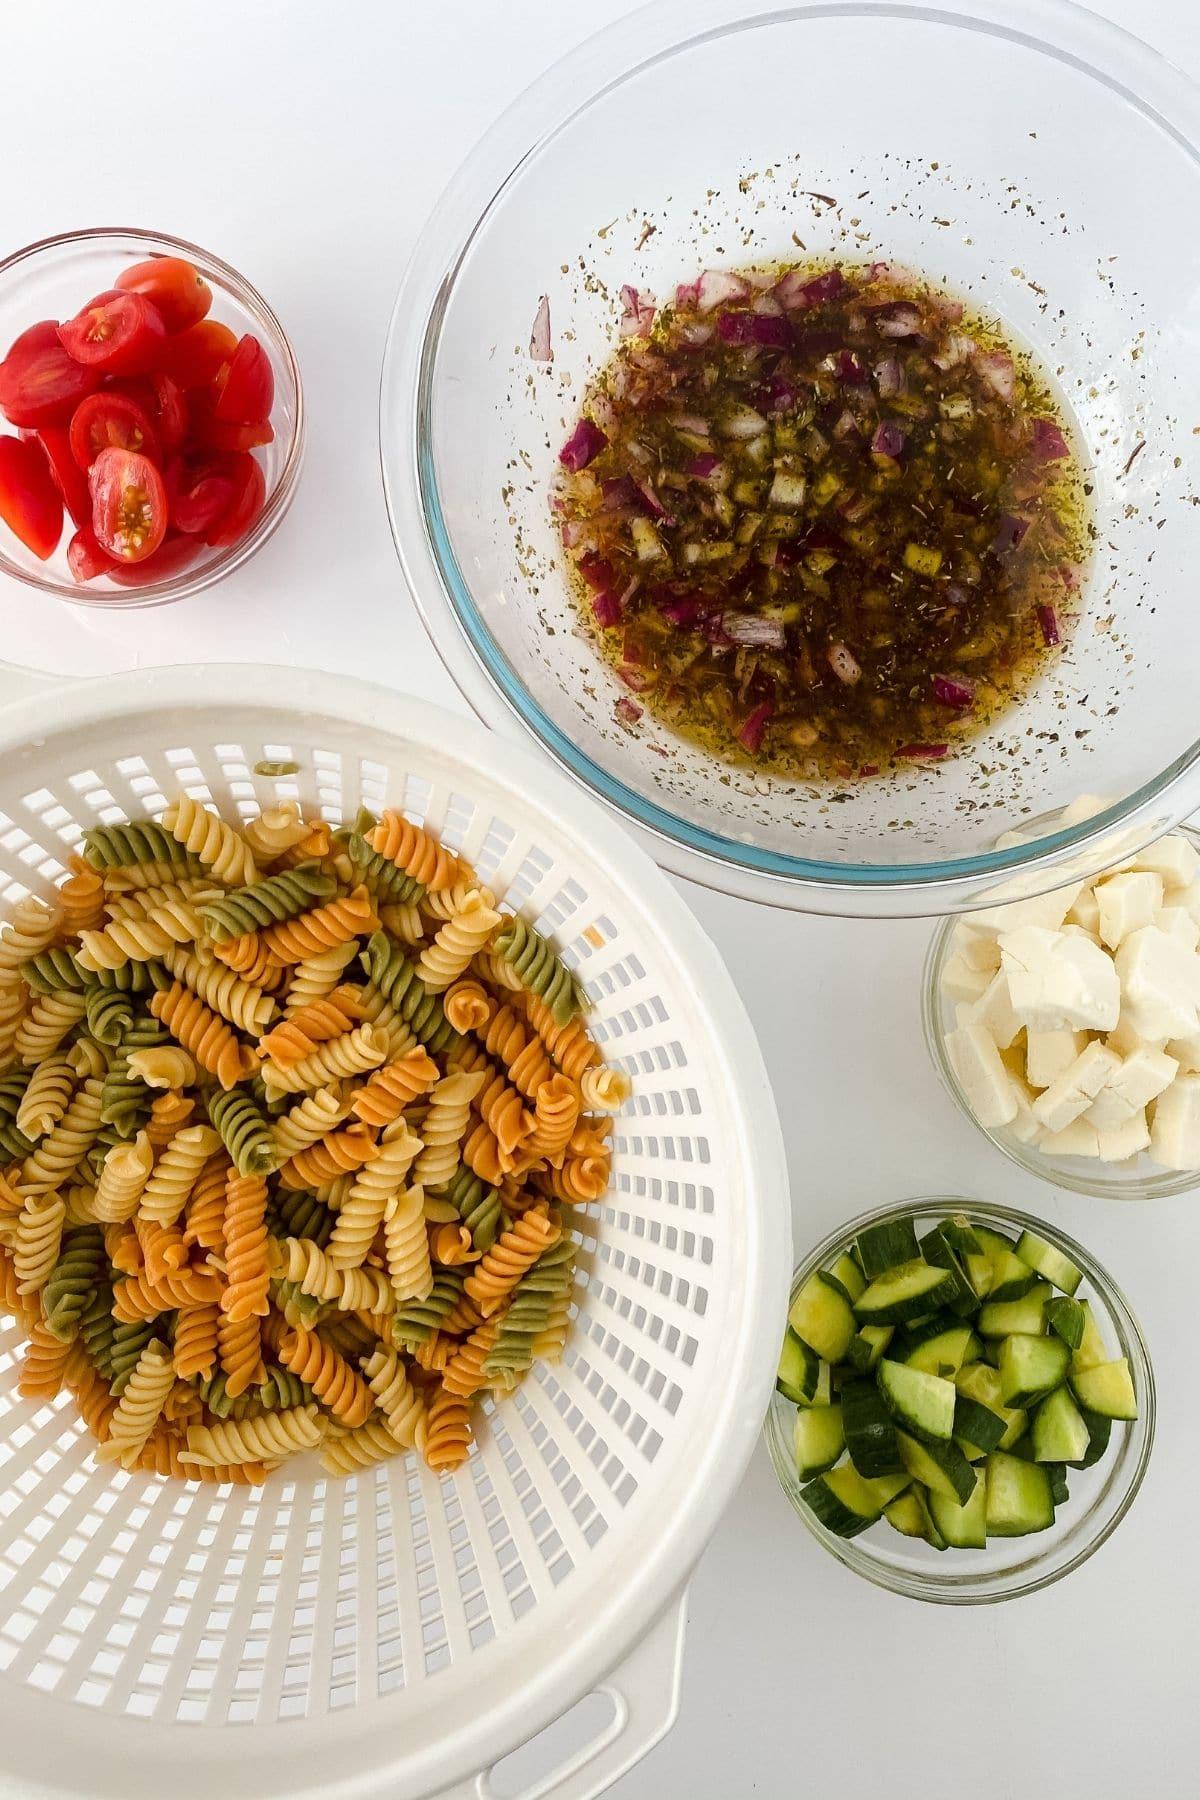 Pasta in white colander next to glass bowl of vinaigrette